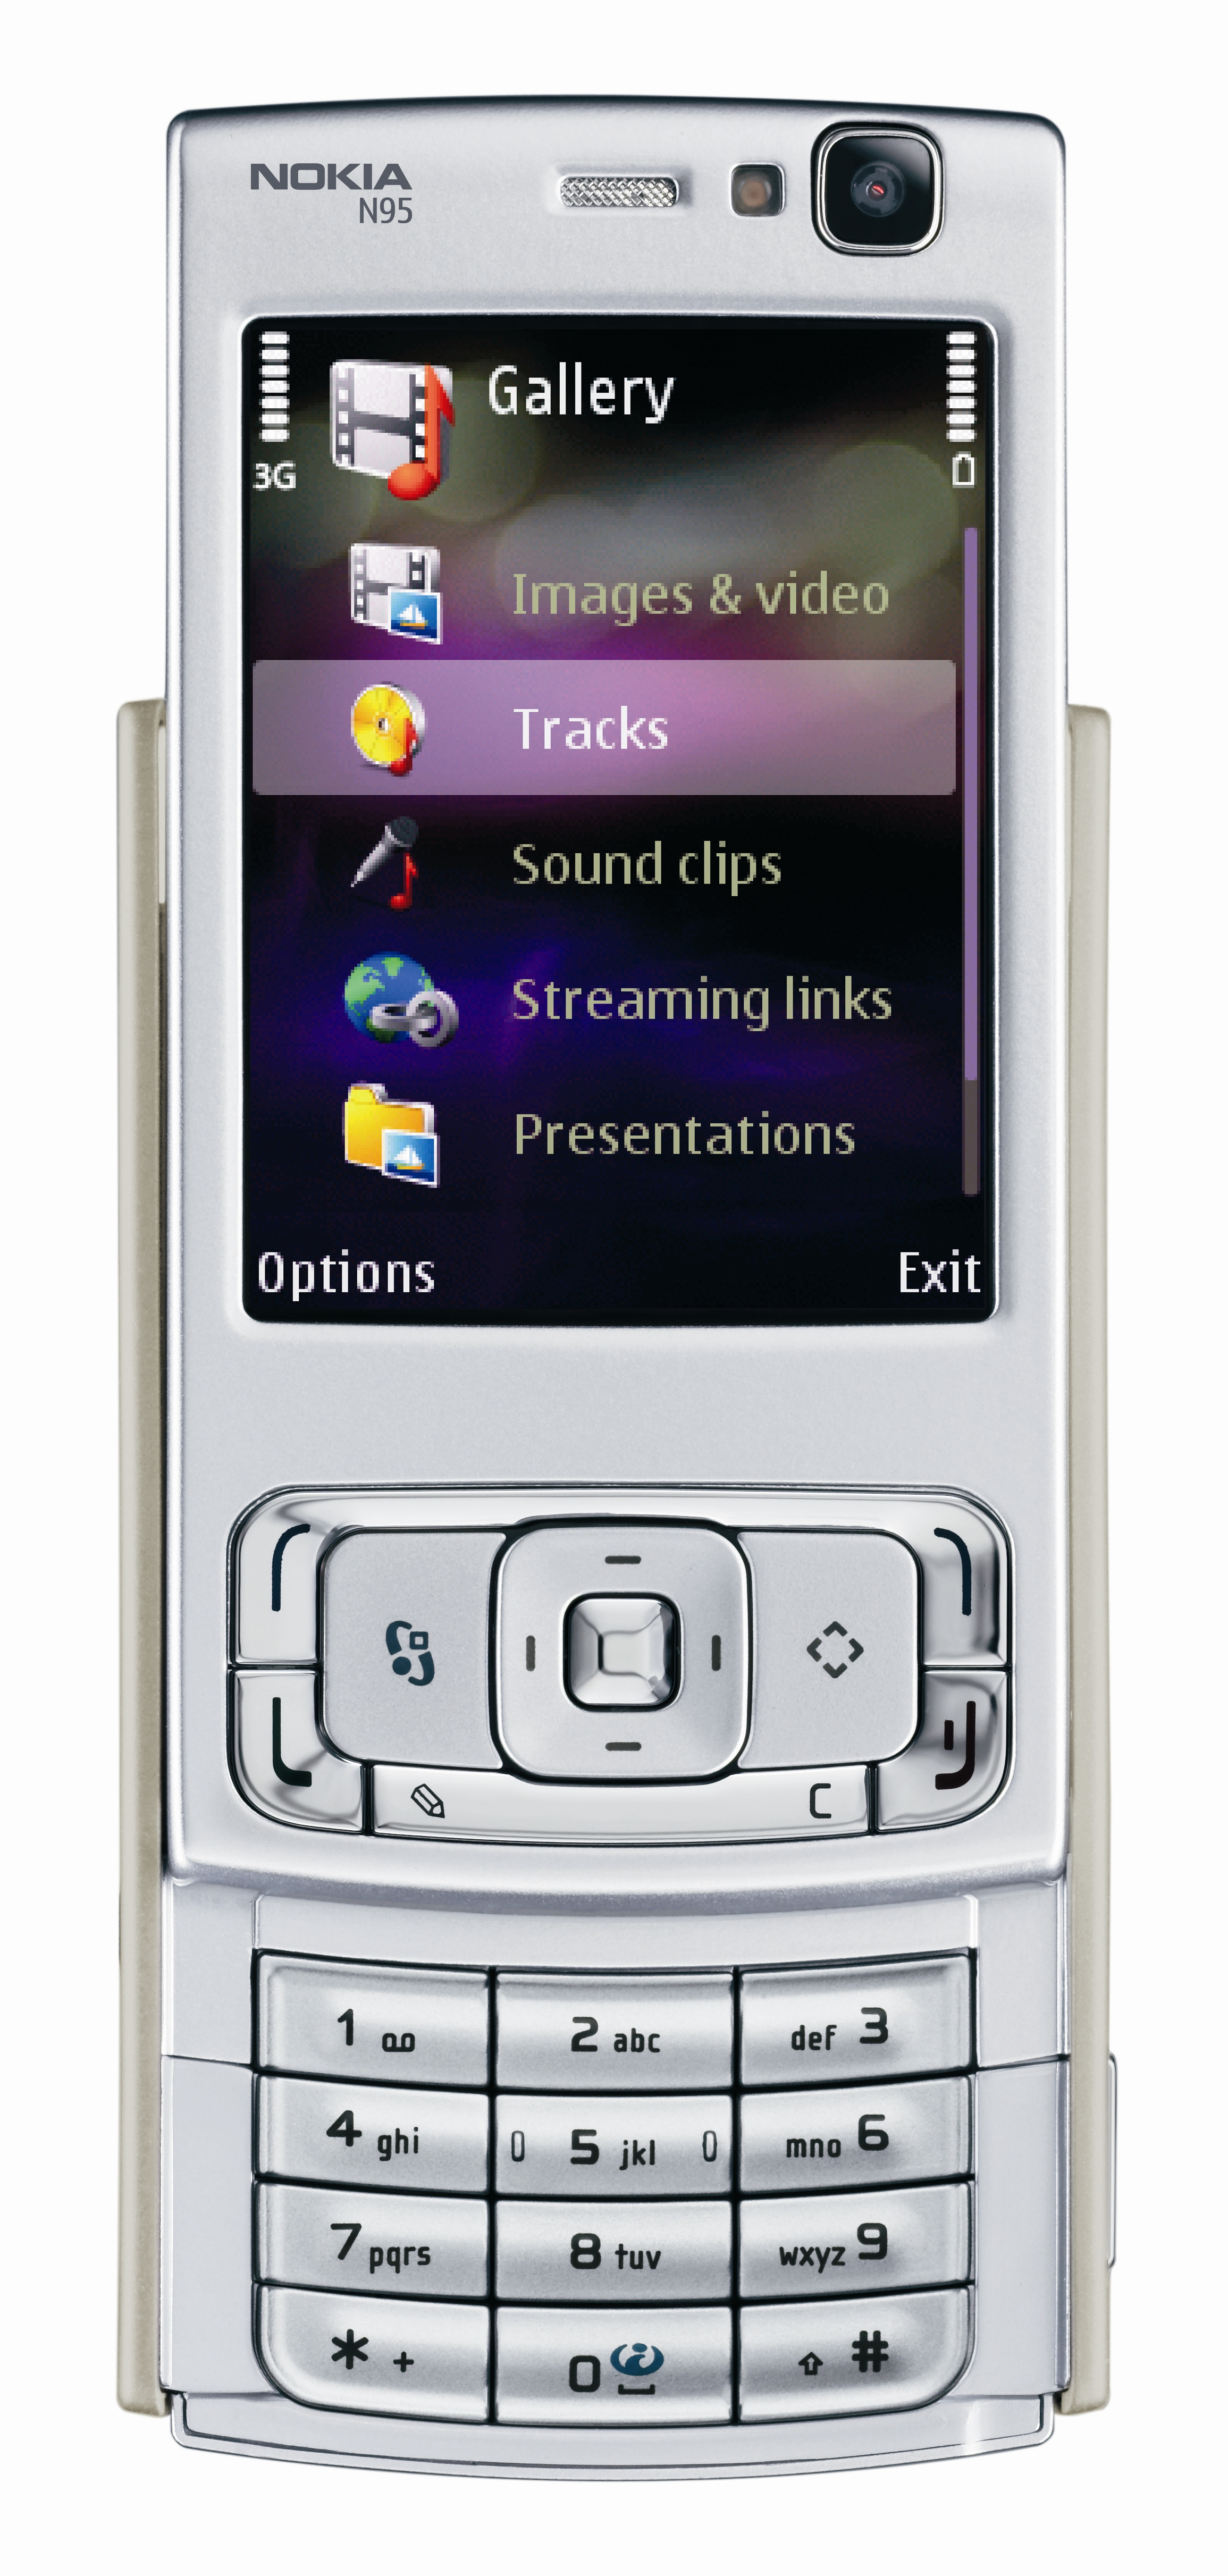 Nokia n95 8gb usb modem drivers for windows 10.